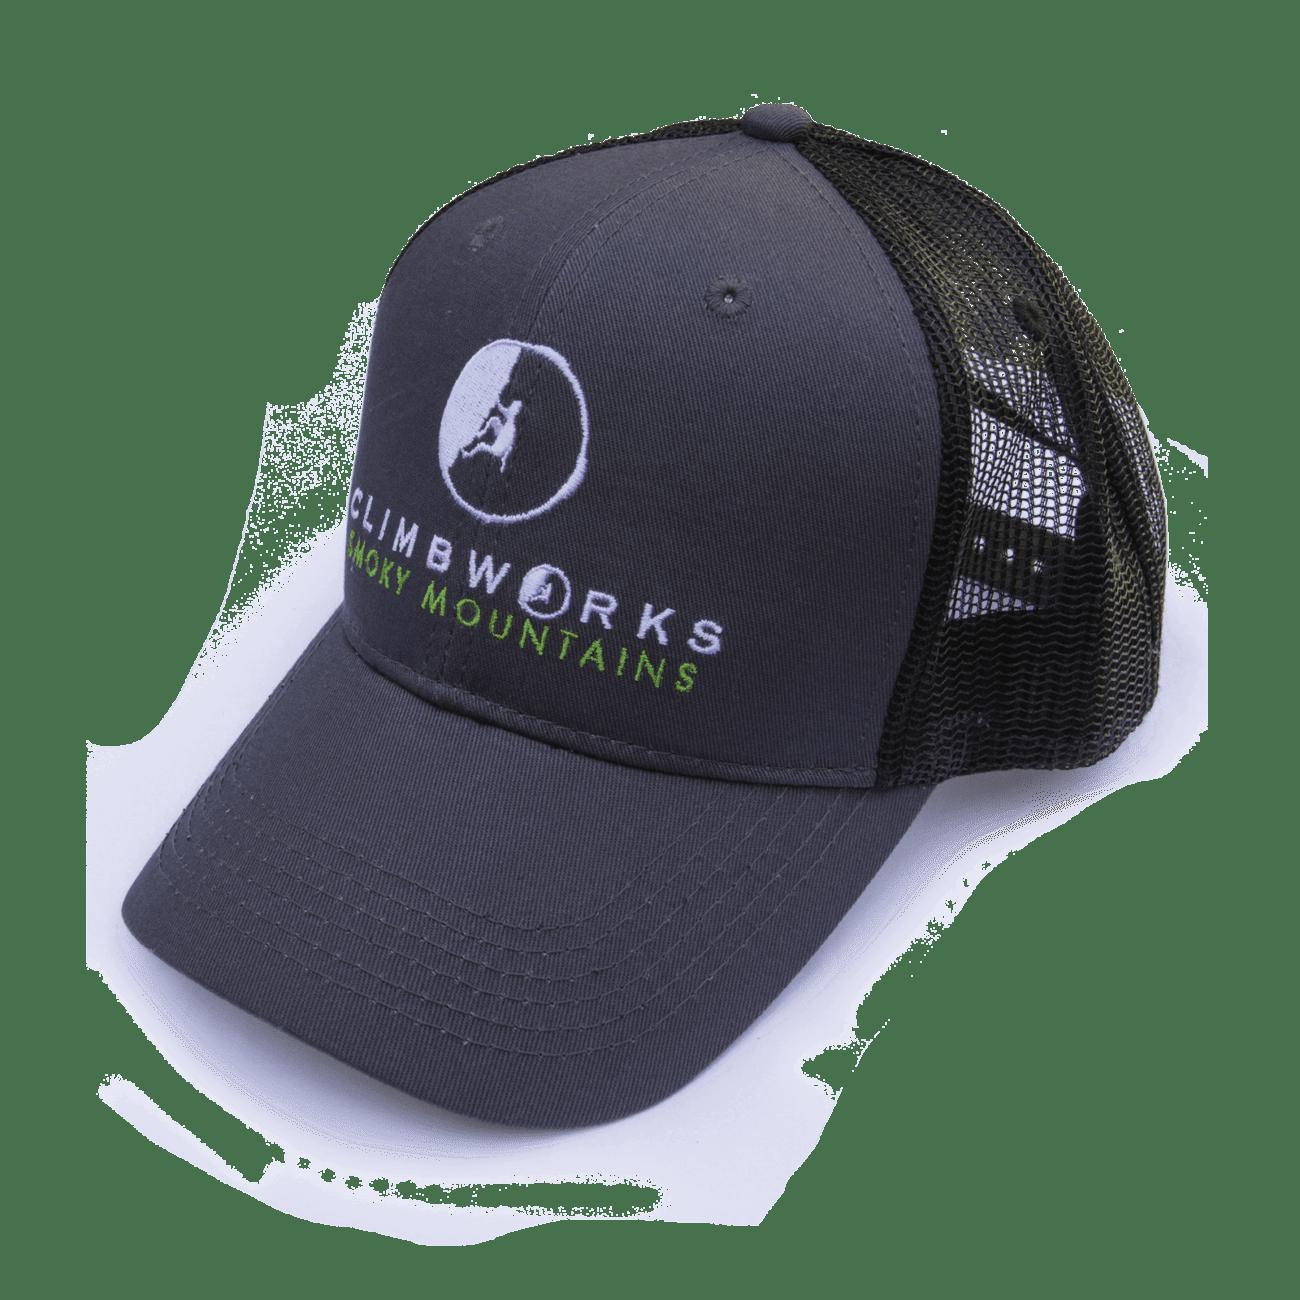 dde0da346e8 Home Hats Classic Smoky Mountains Trucker. Classic-cwsm-grey